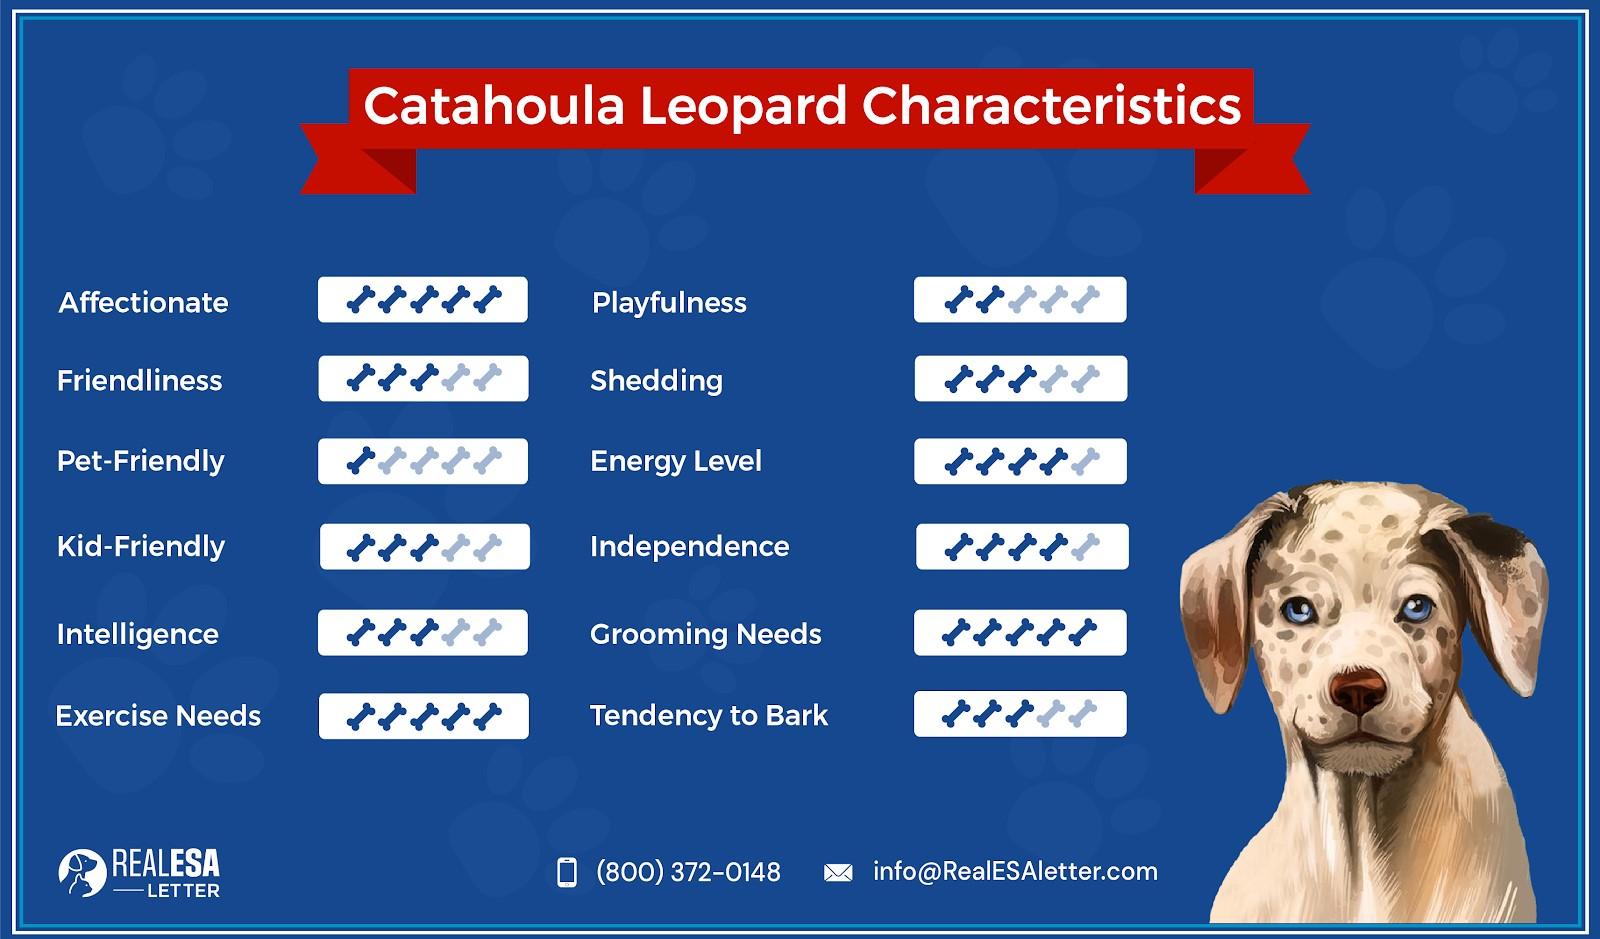 Catahoula Leopard characteristics